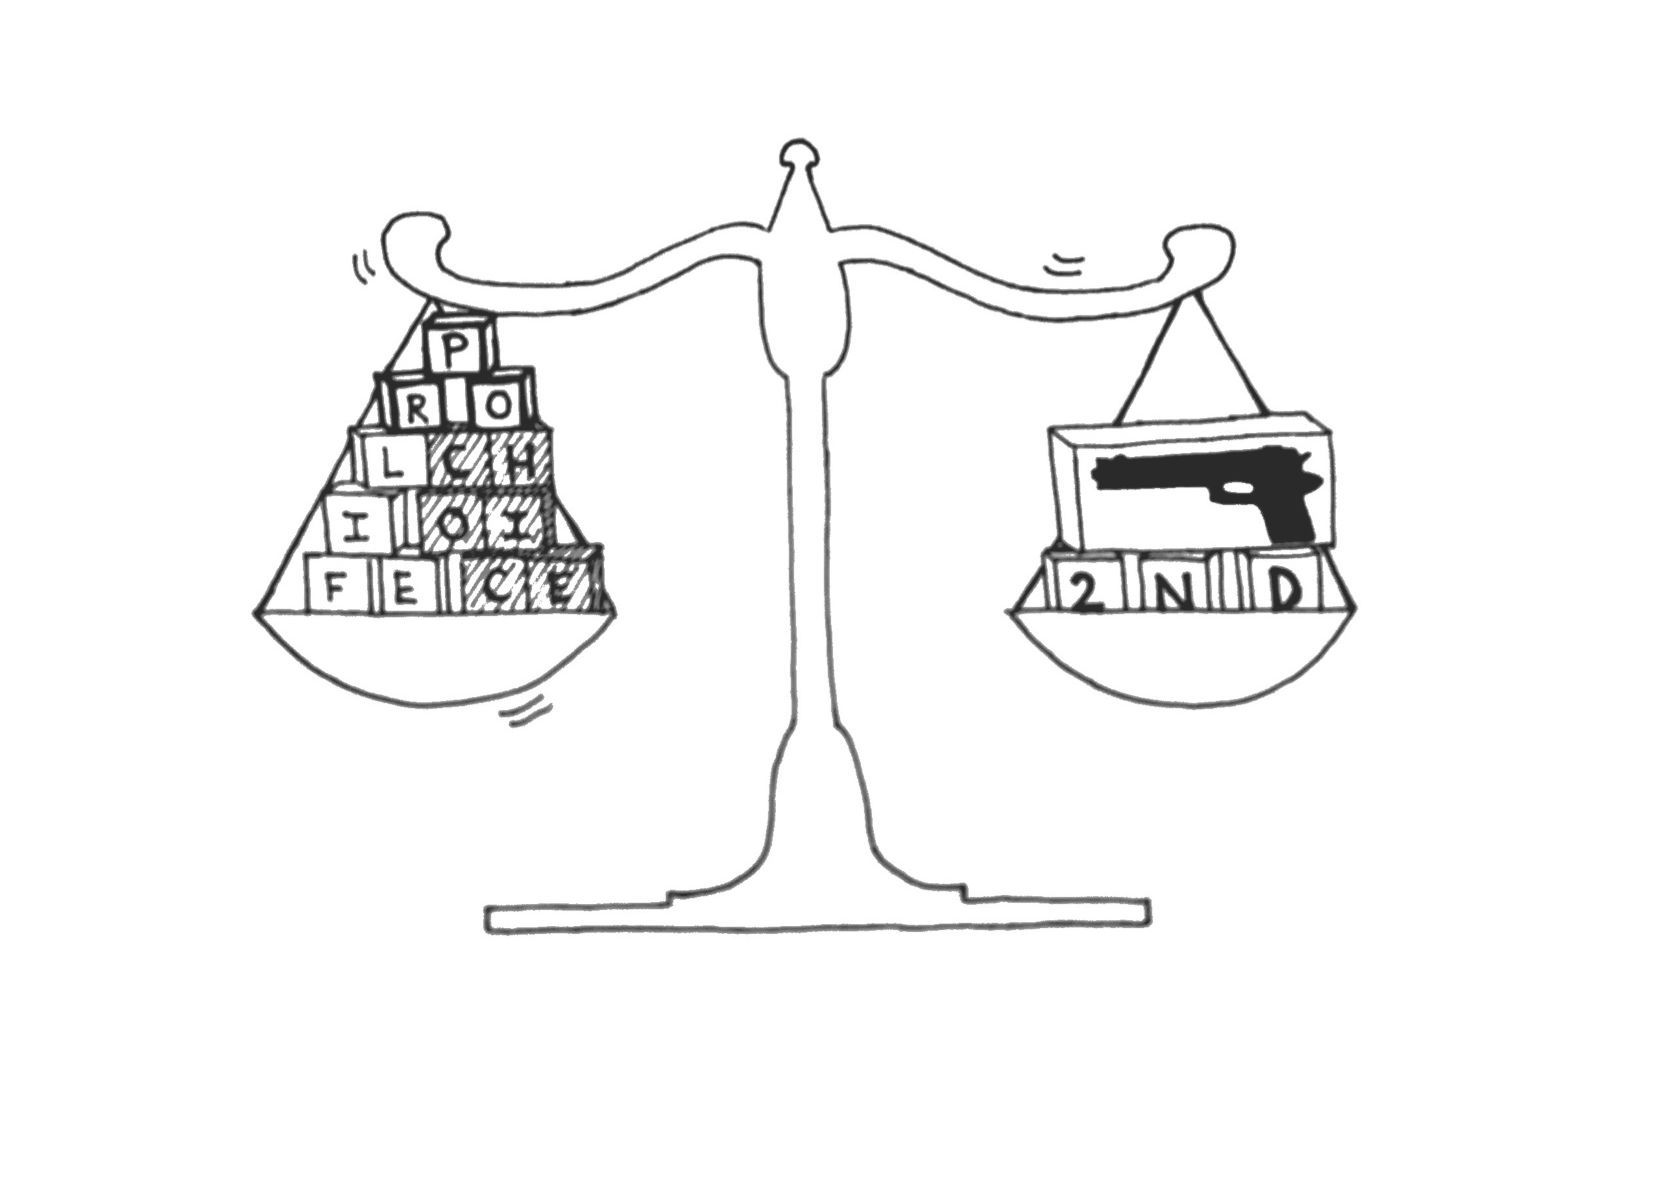 The supreme job of nominating judges